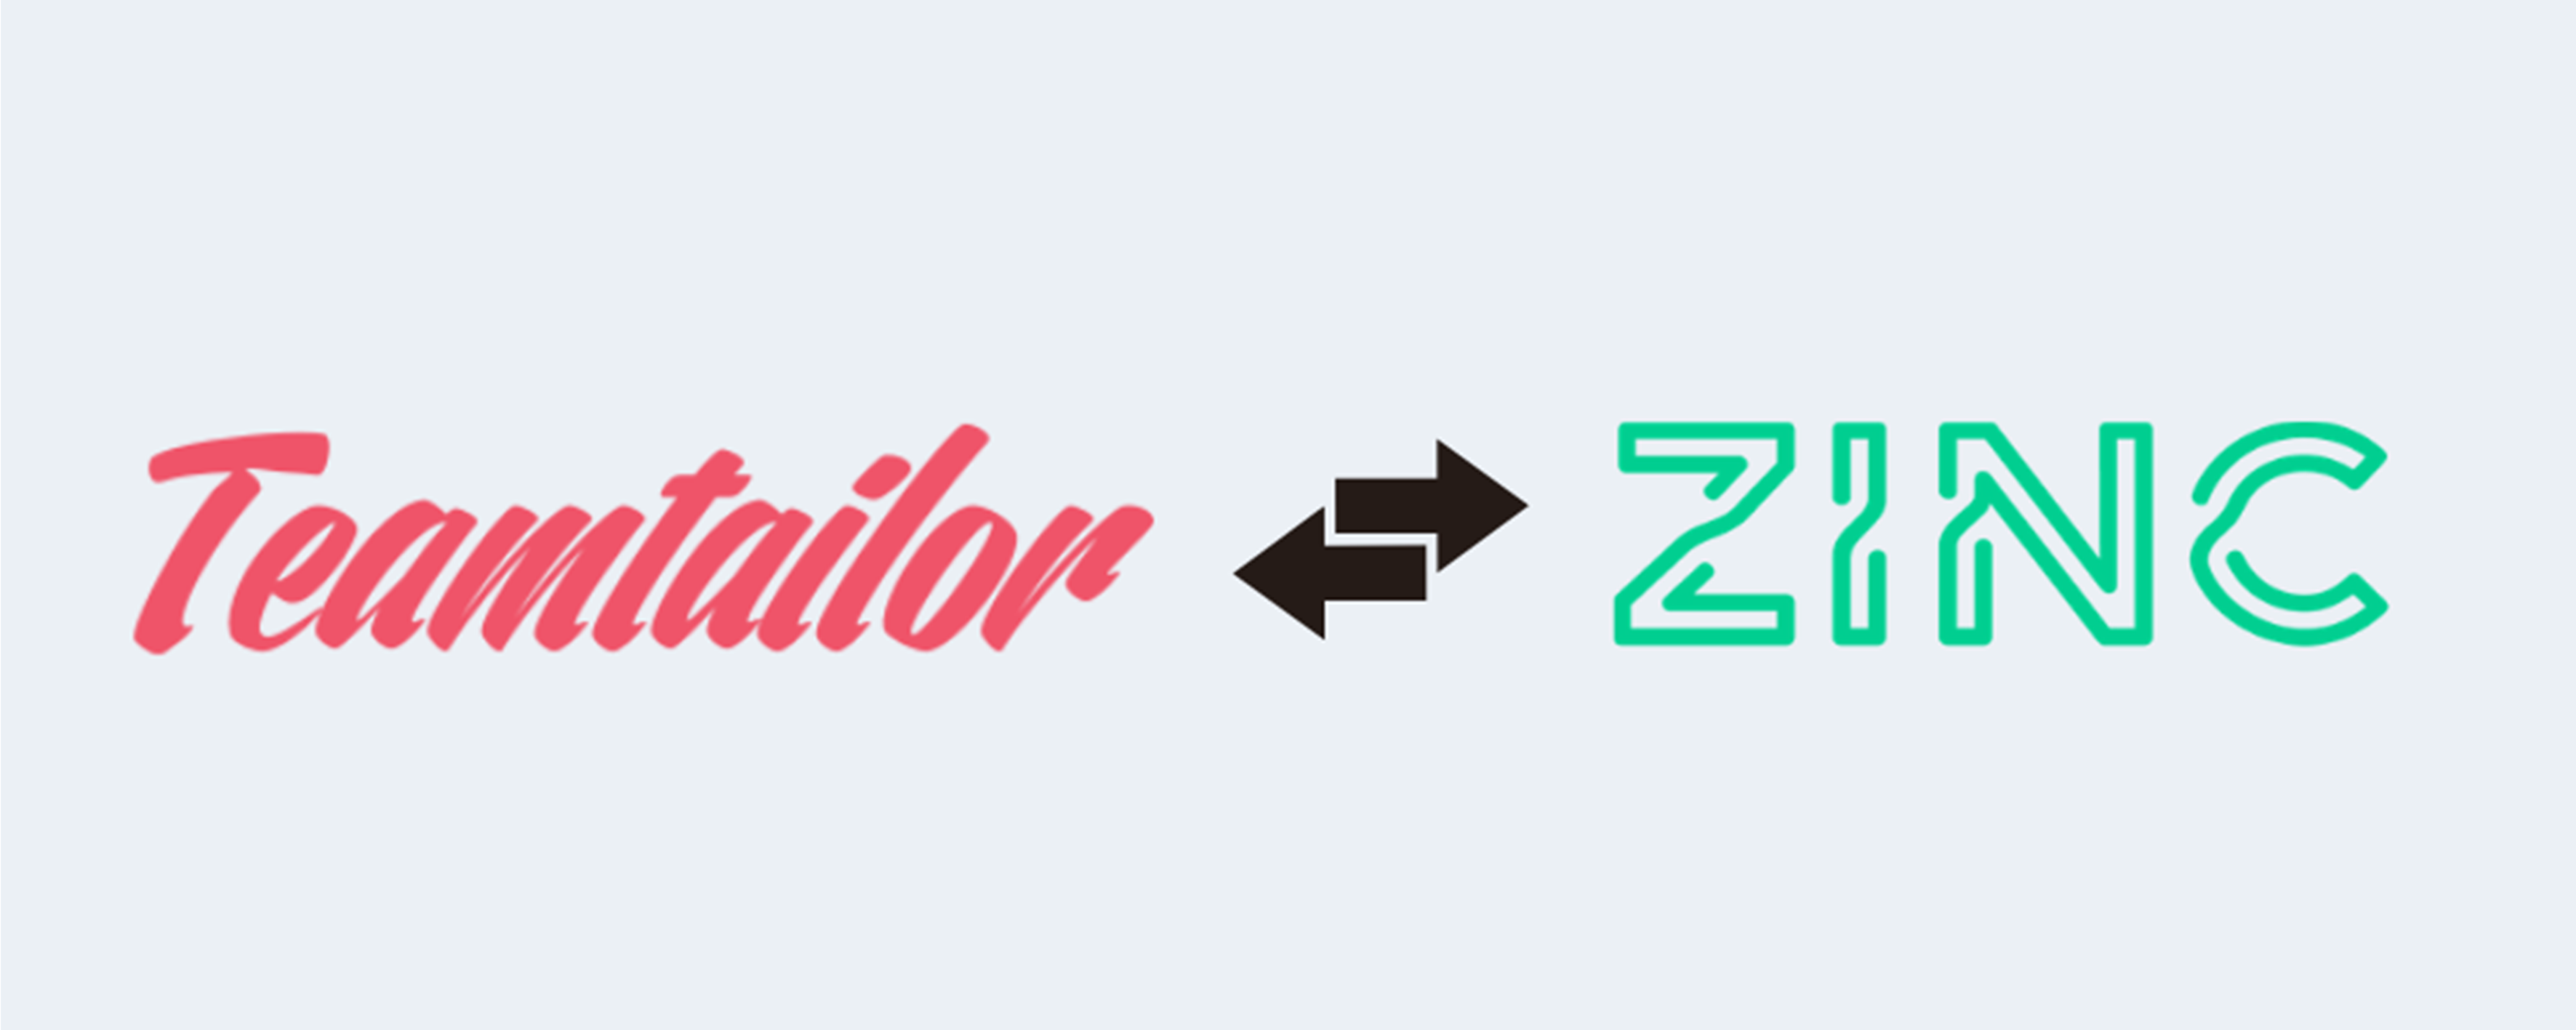 teamtailor zinc header